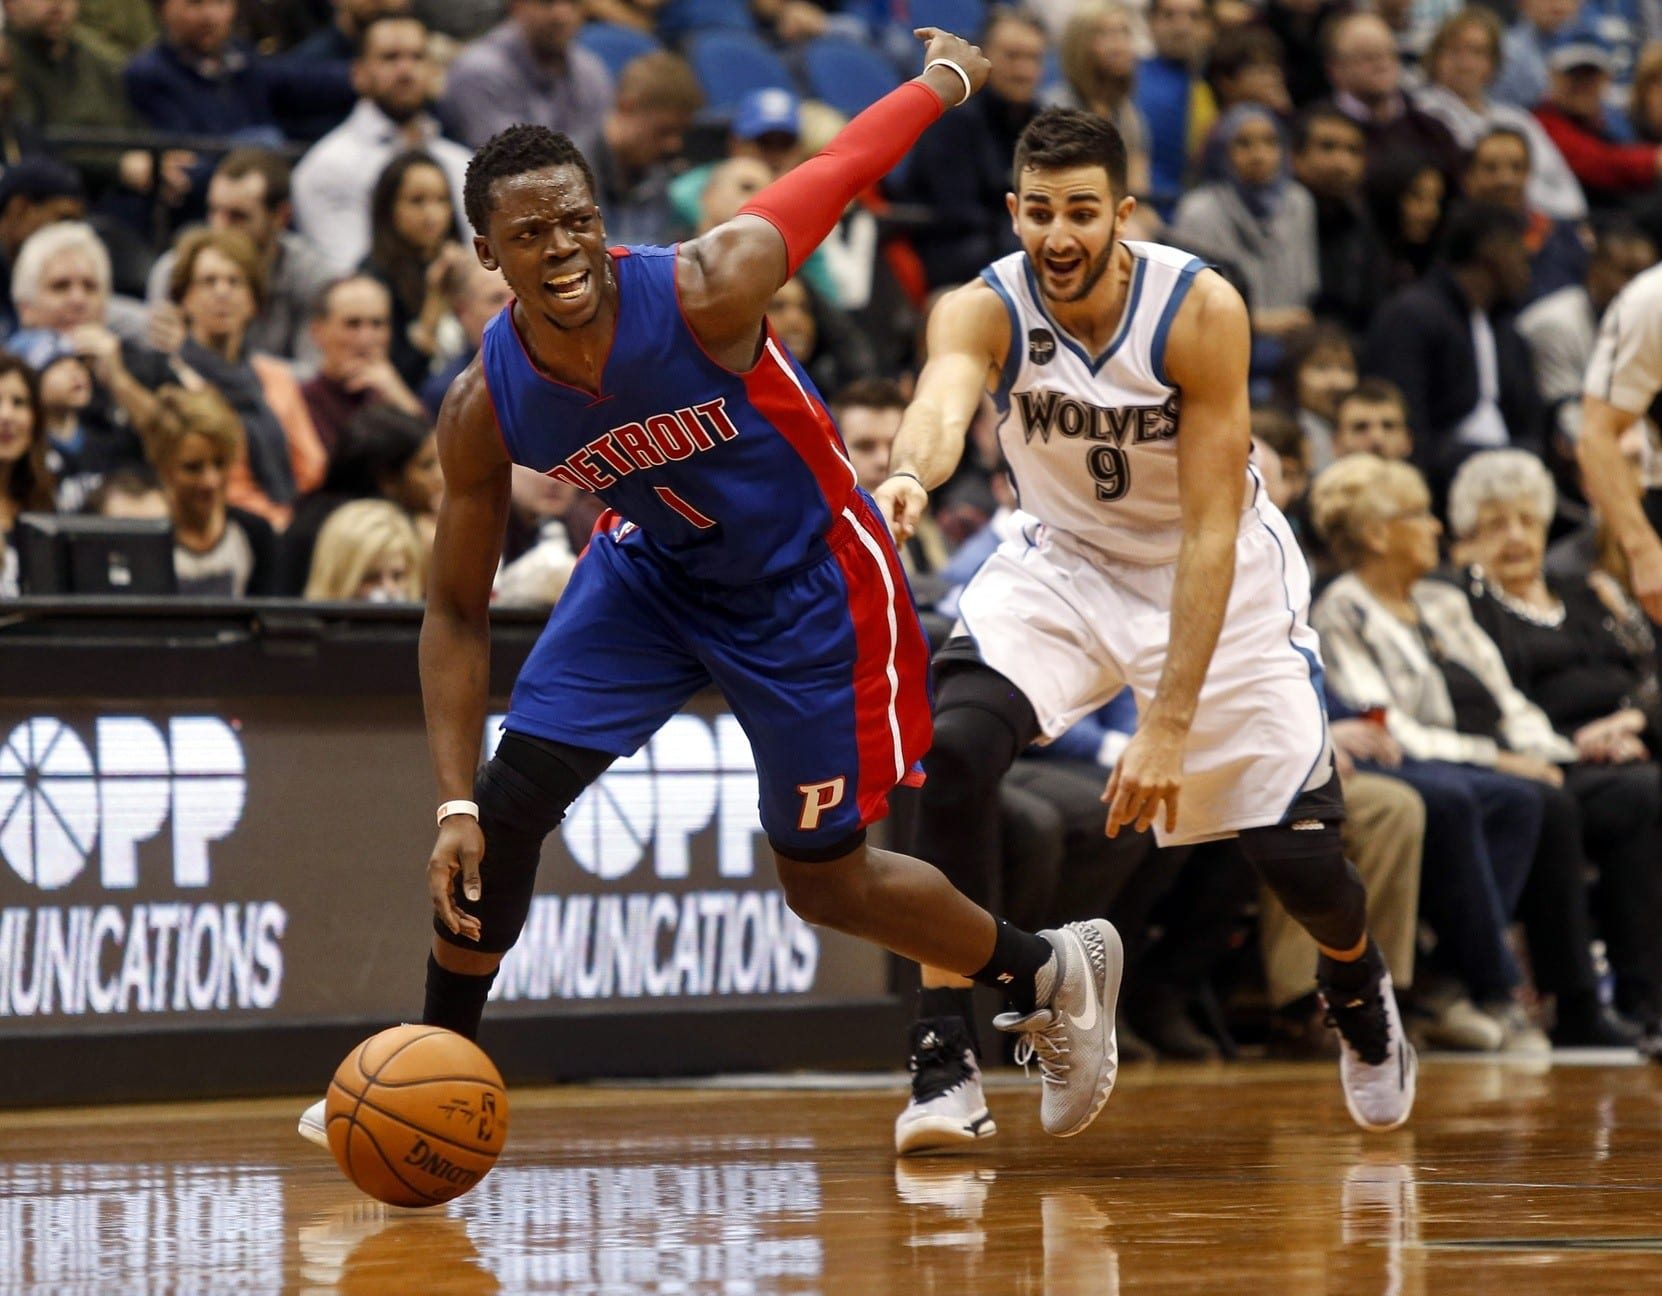 Nba Rumors: Reggie Jackson & Ricky Rubio Headline Potential Minnesota-detroit Swap